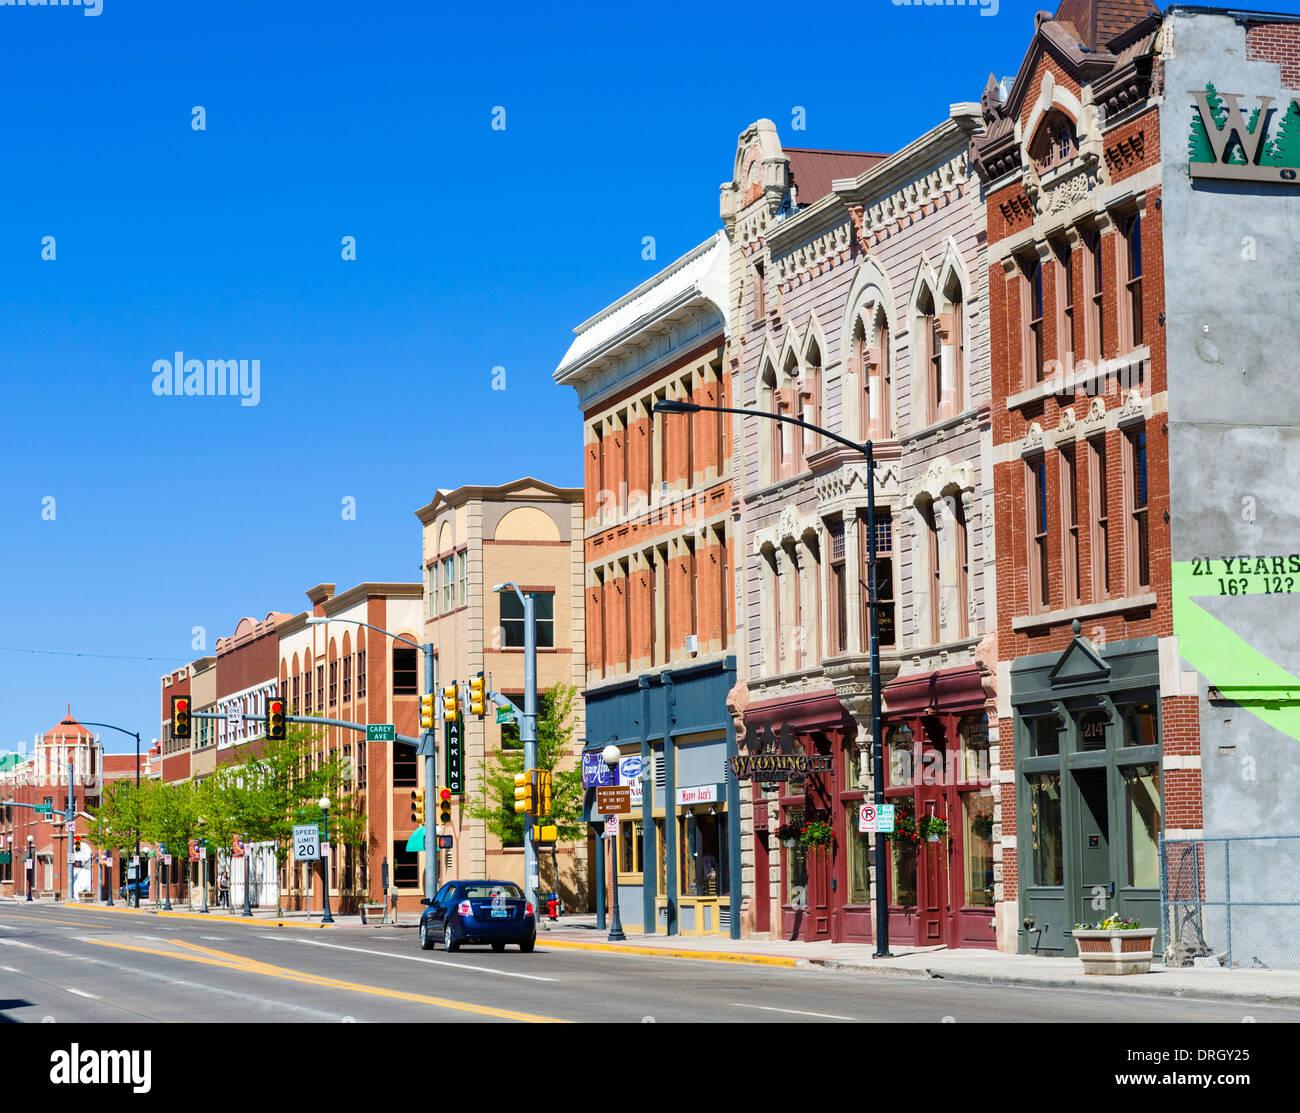 Pictures : downtown cheyenne wyoming | Cheyenne Wyoming